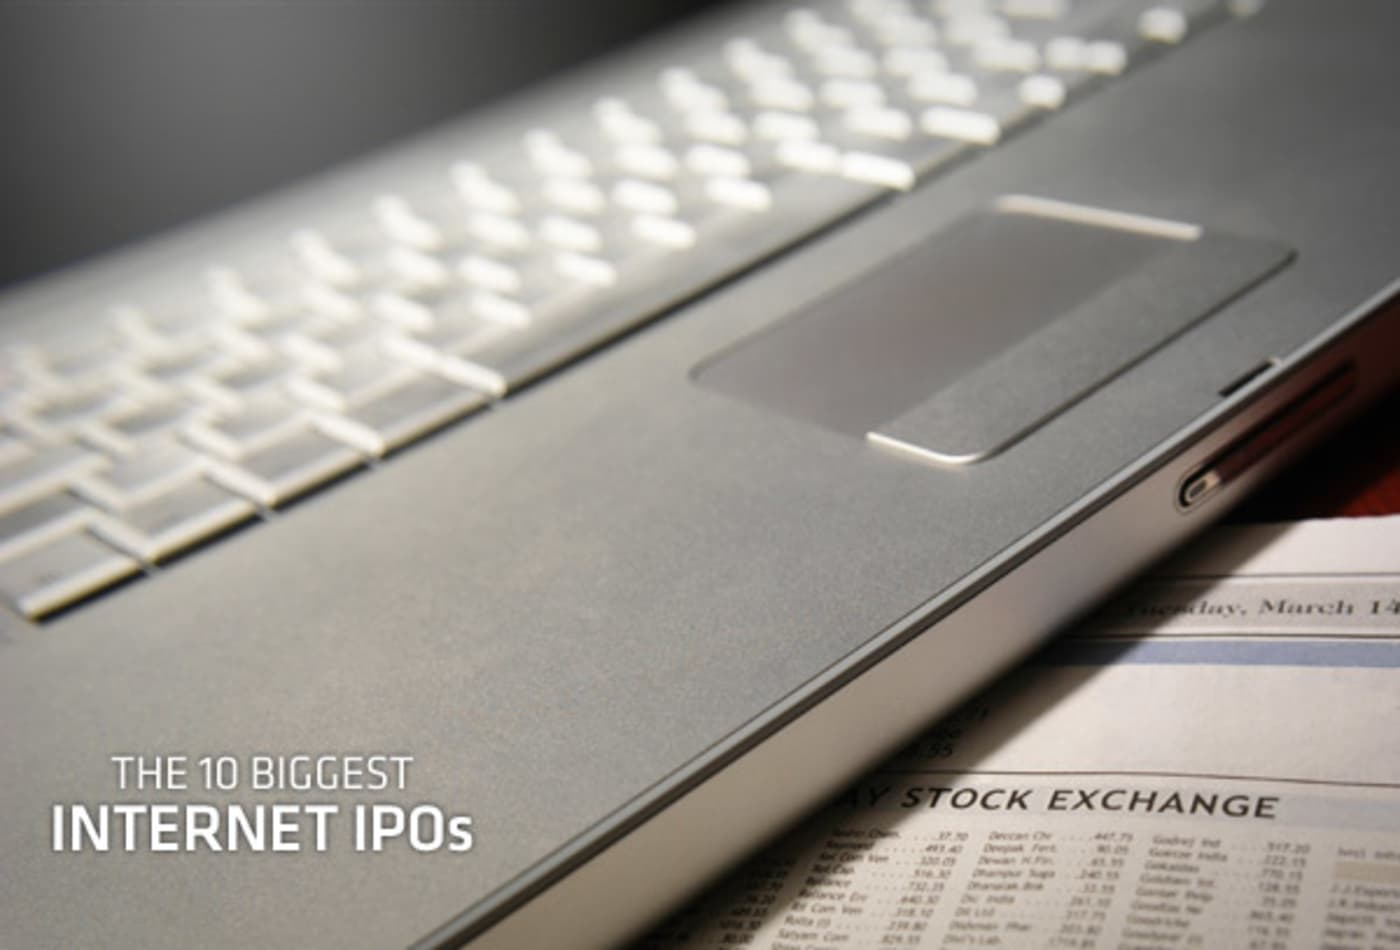 10-biggest-internet-IPO-cover2.jpg